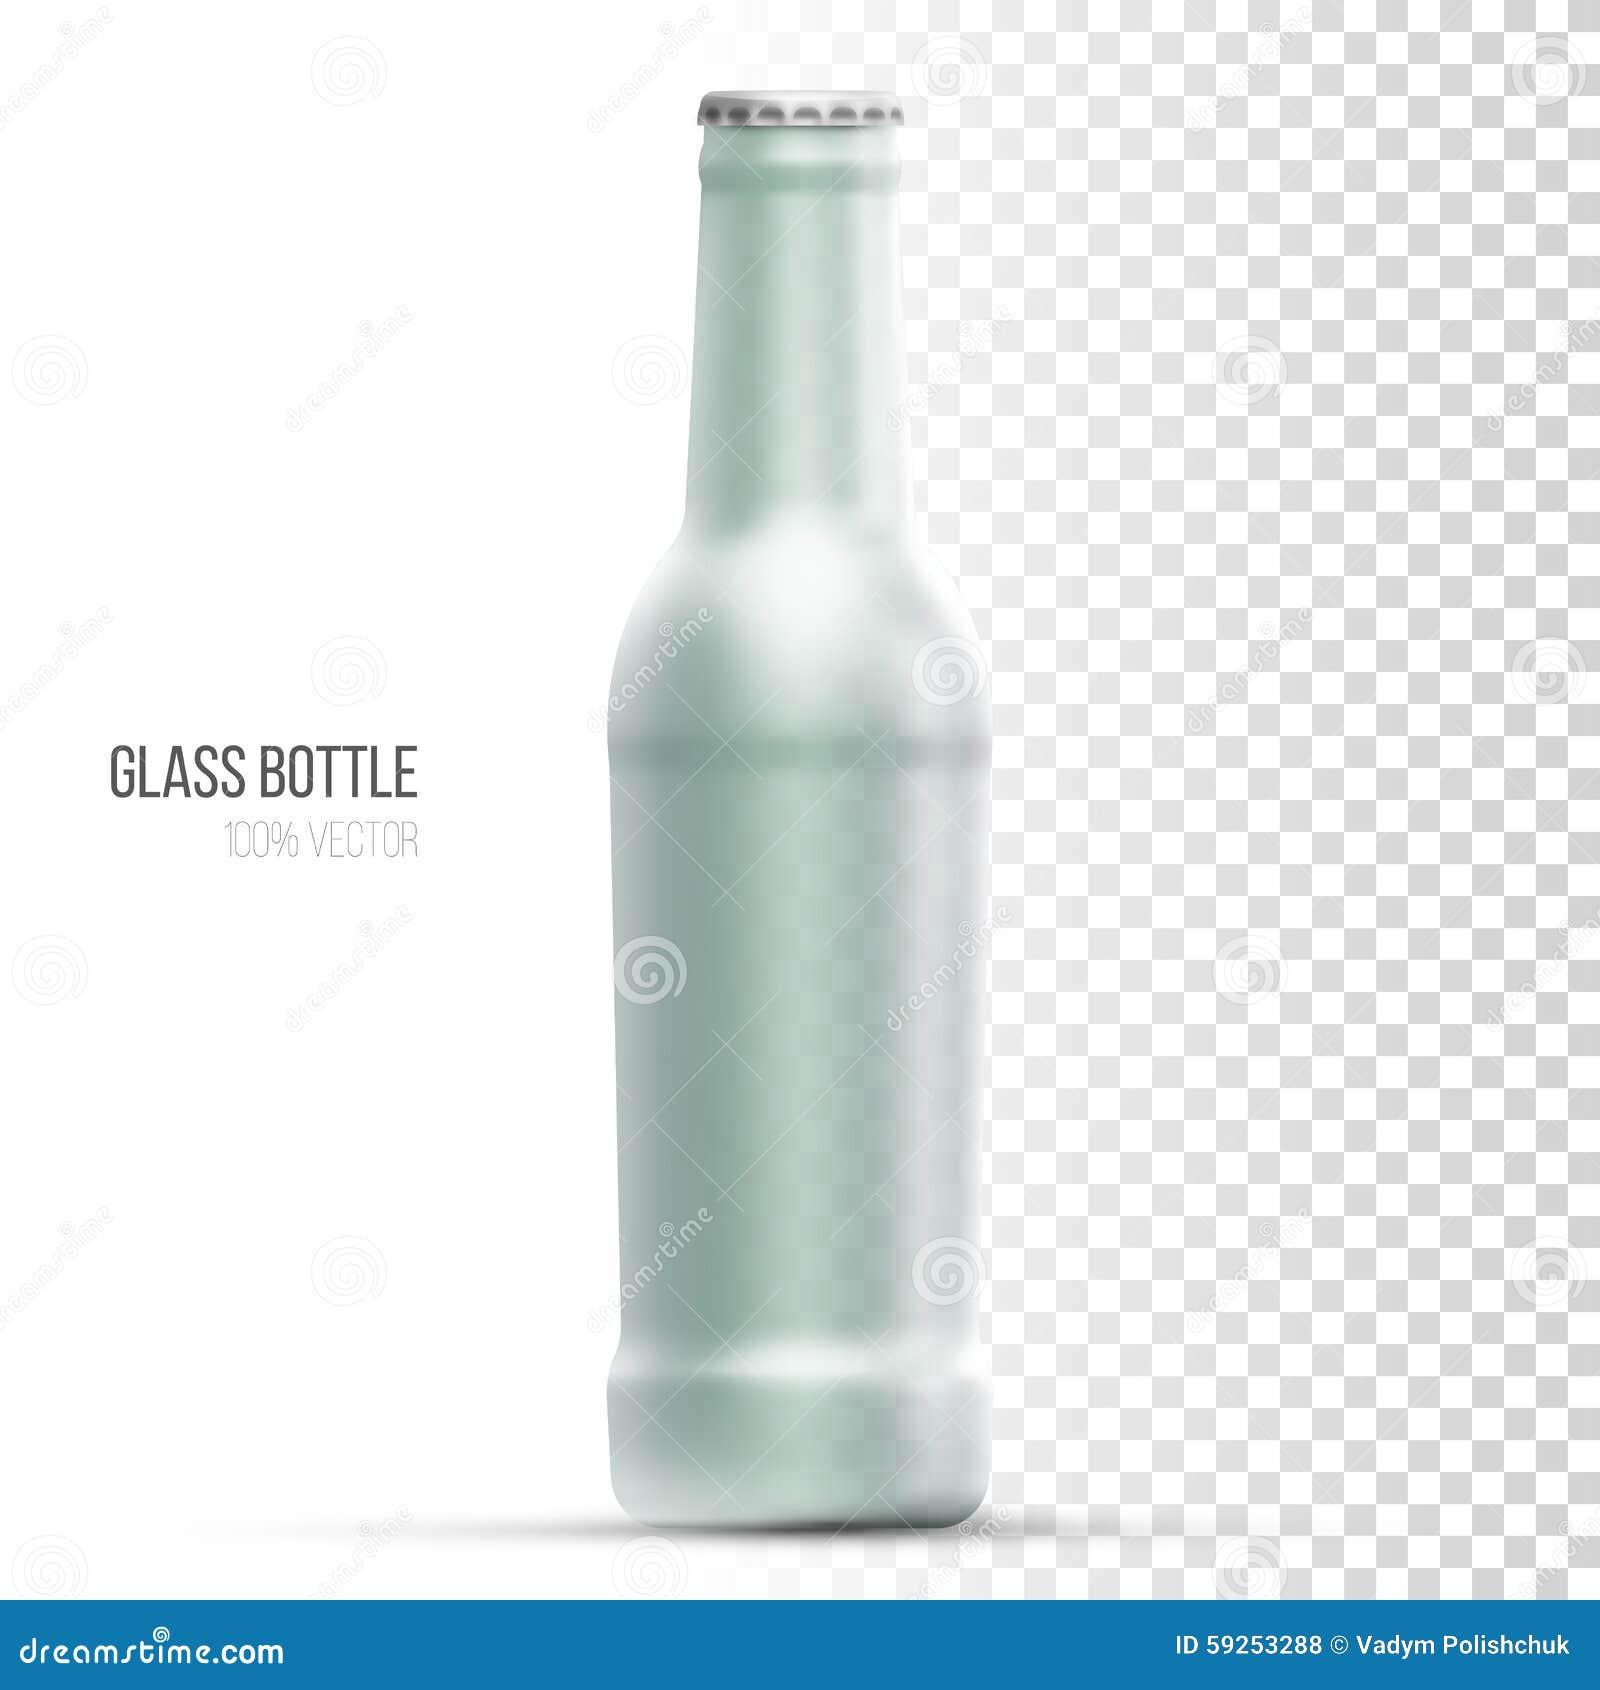 Template Of Glass Bottles For Liquid  Stock Vector - Illustration of